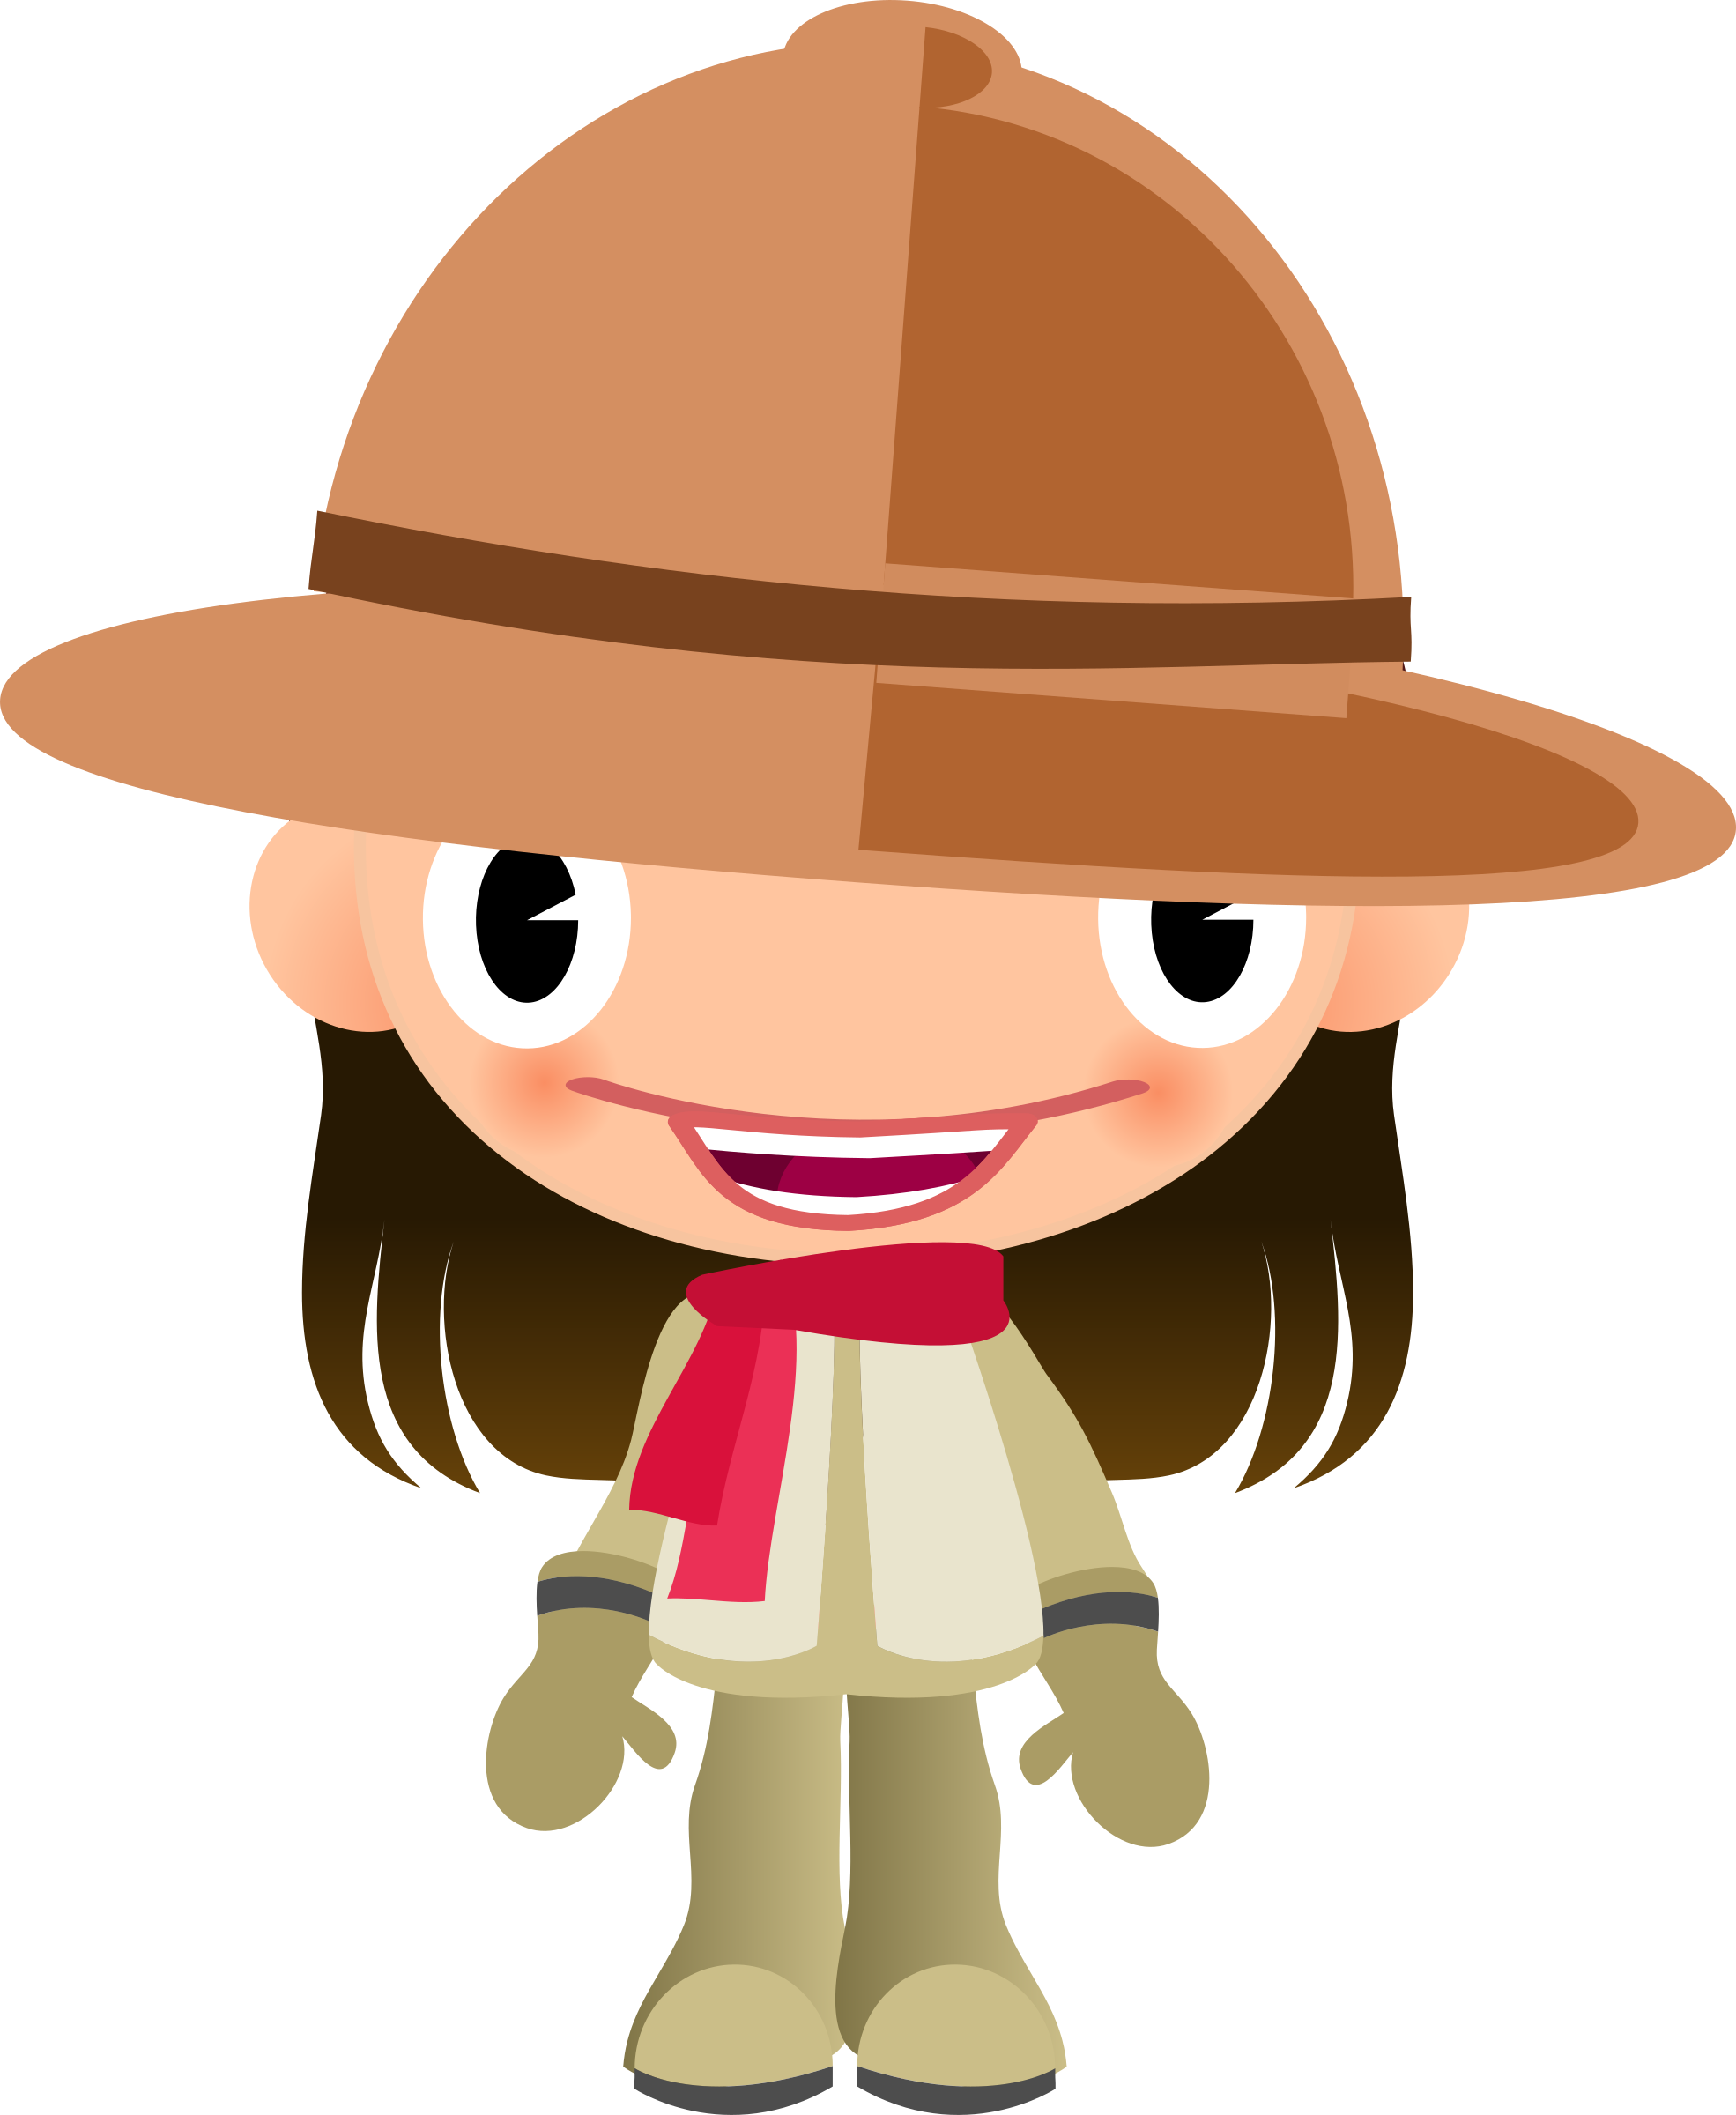 Talking girl in clothes. Explorer clipart safari trip